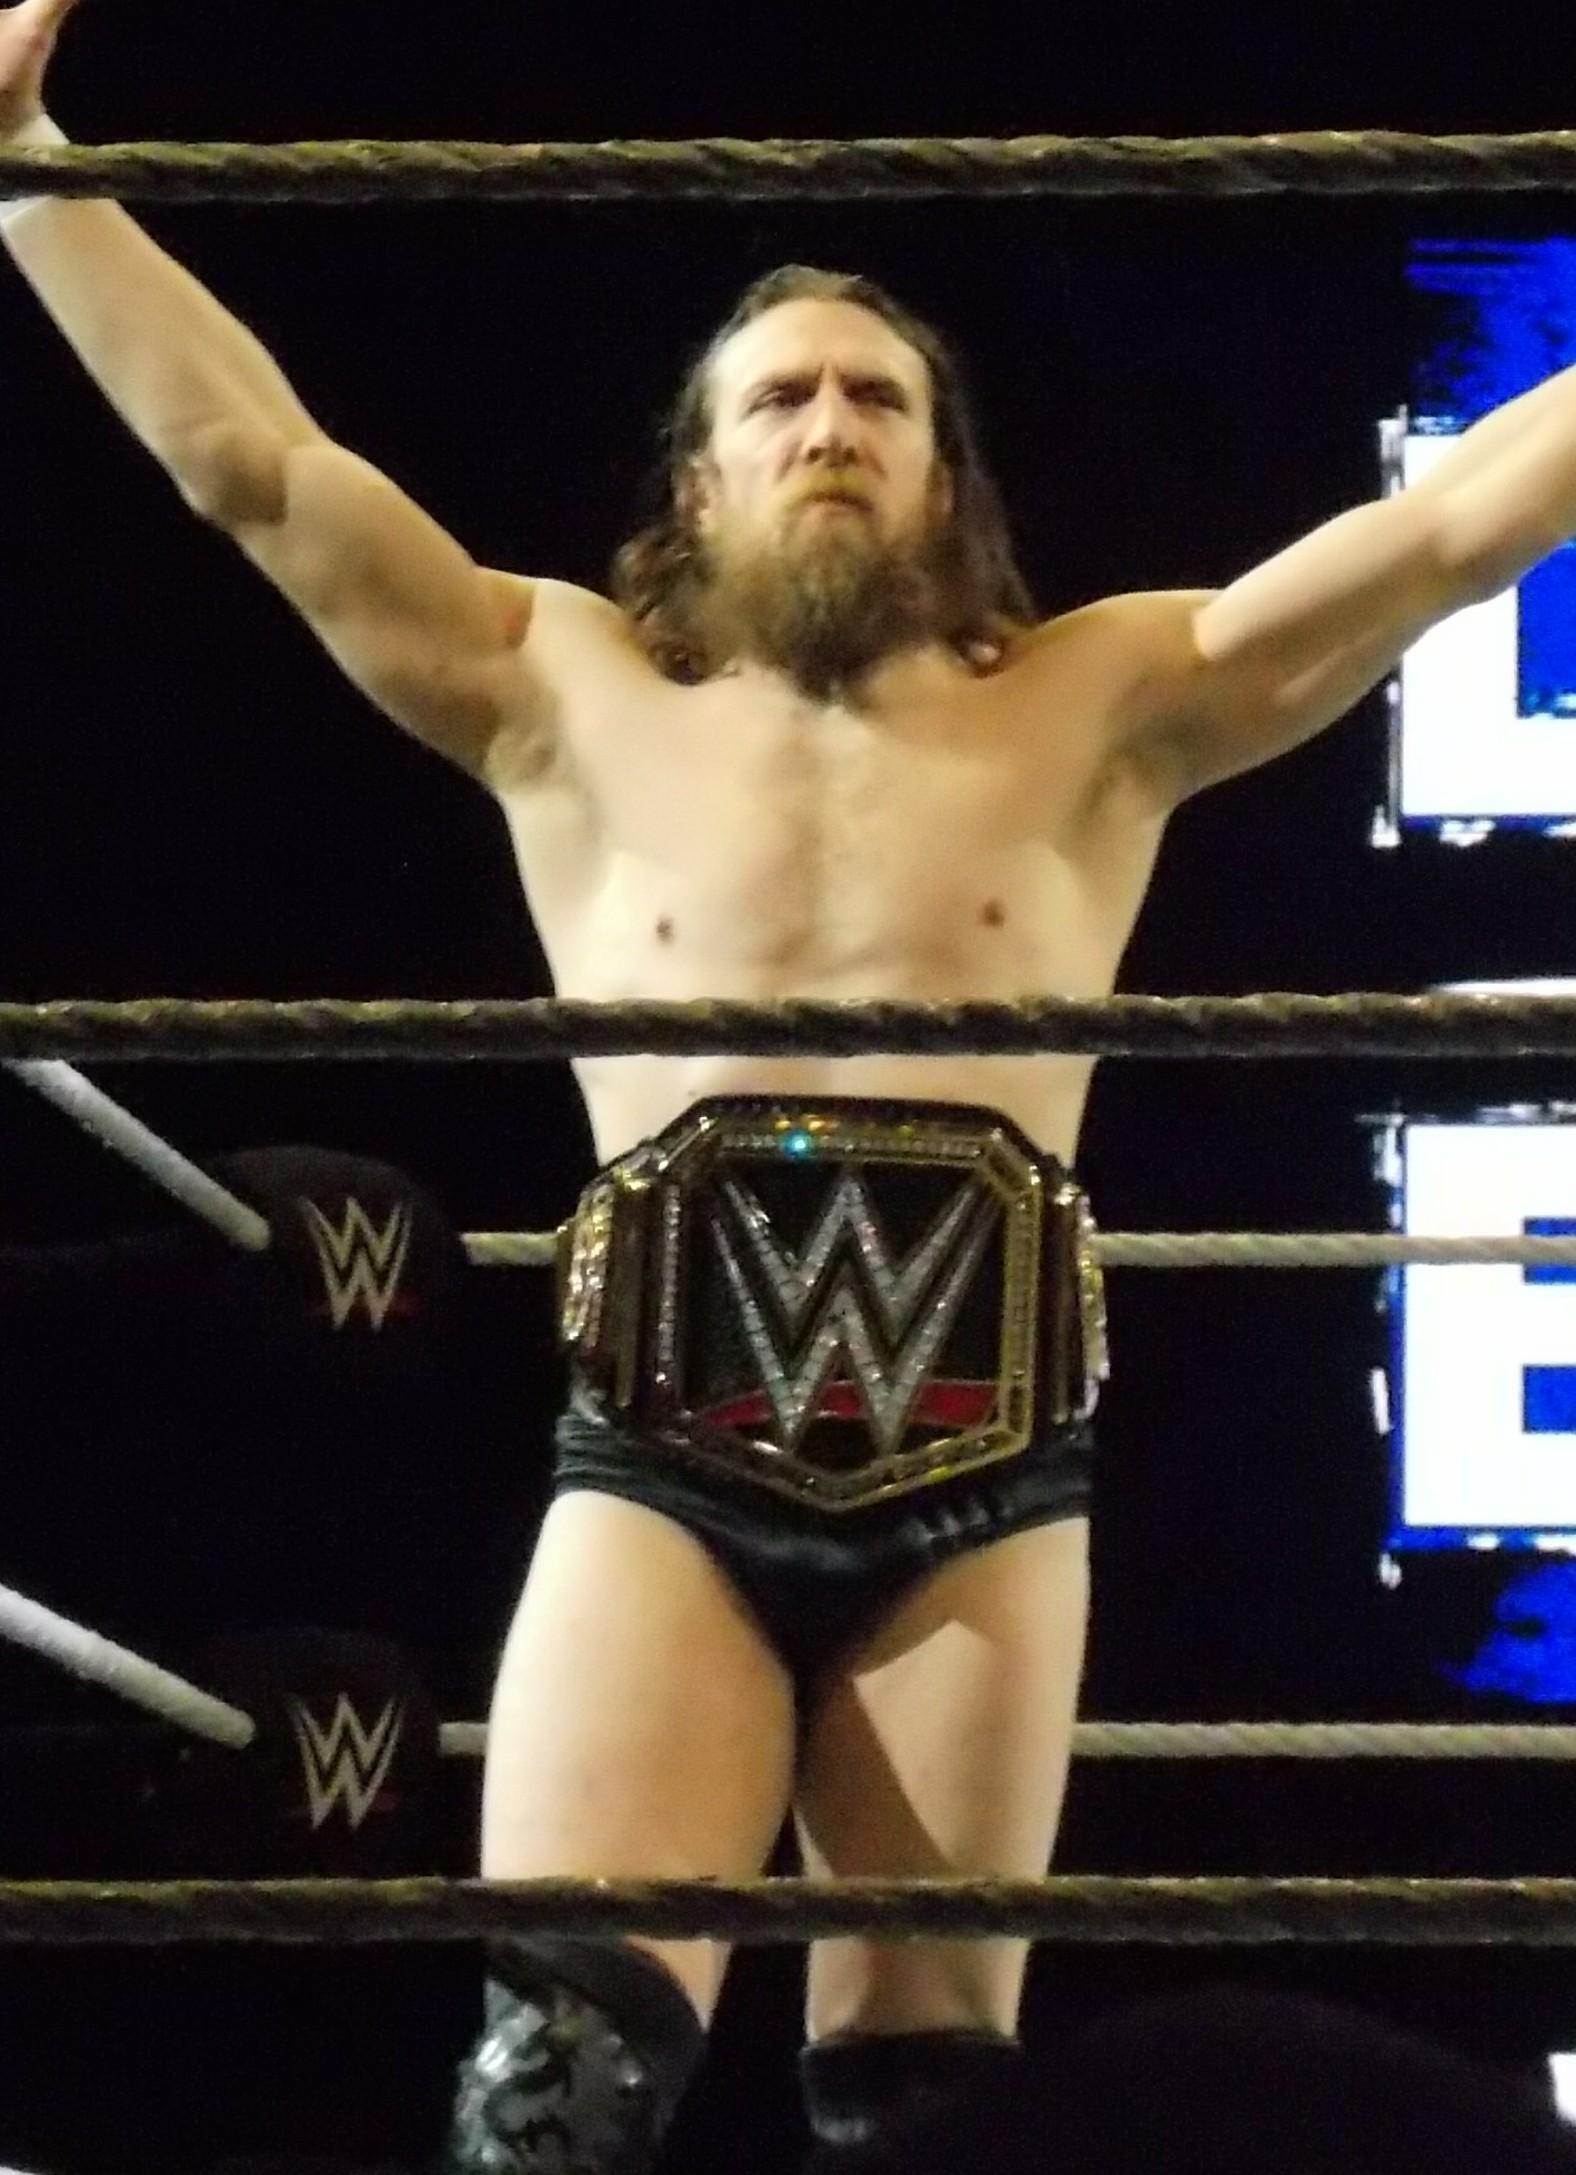 File:Daniel Bryan WWE Champion 2019.jpg - Wikipedia